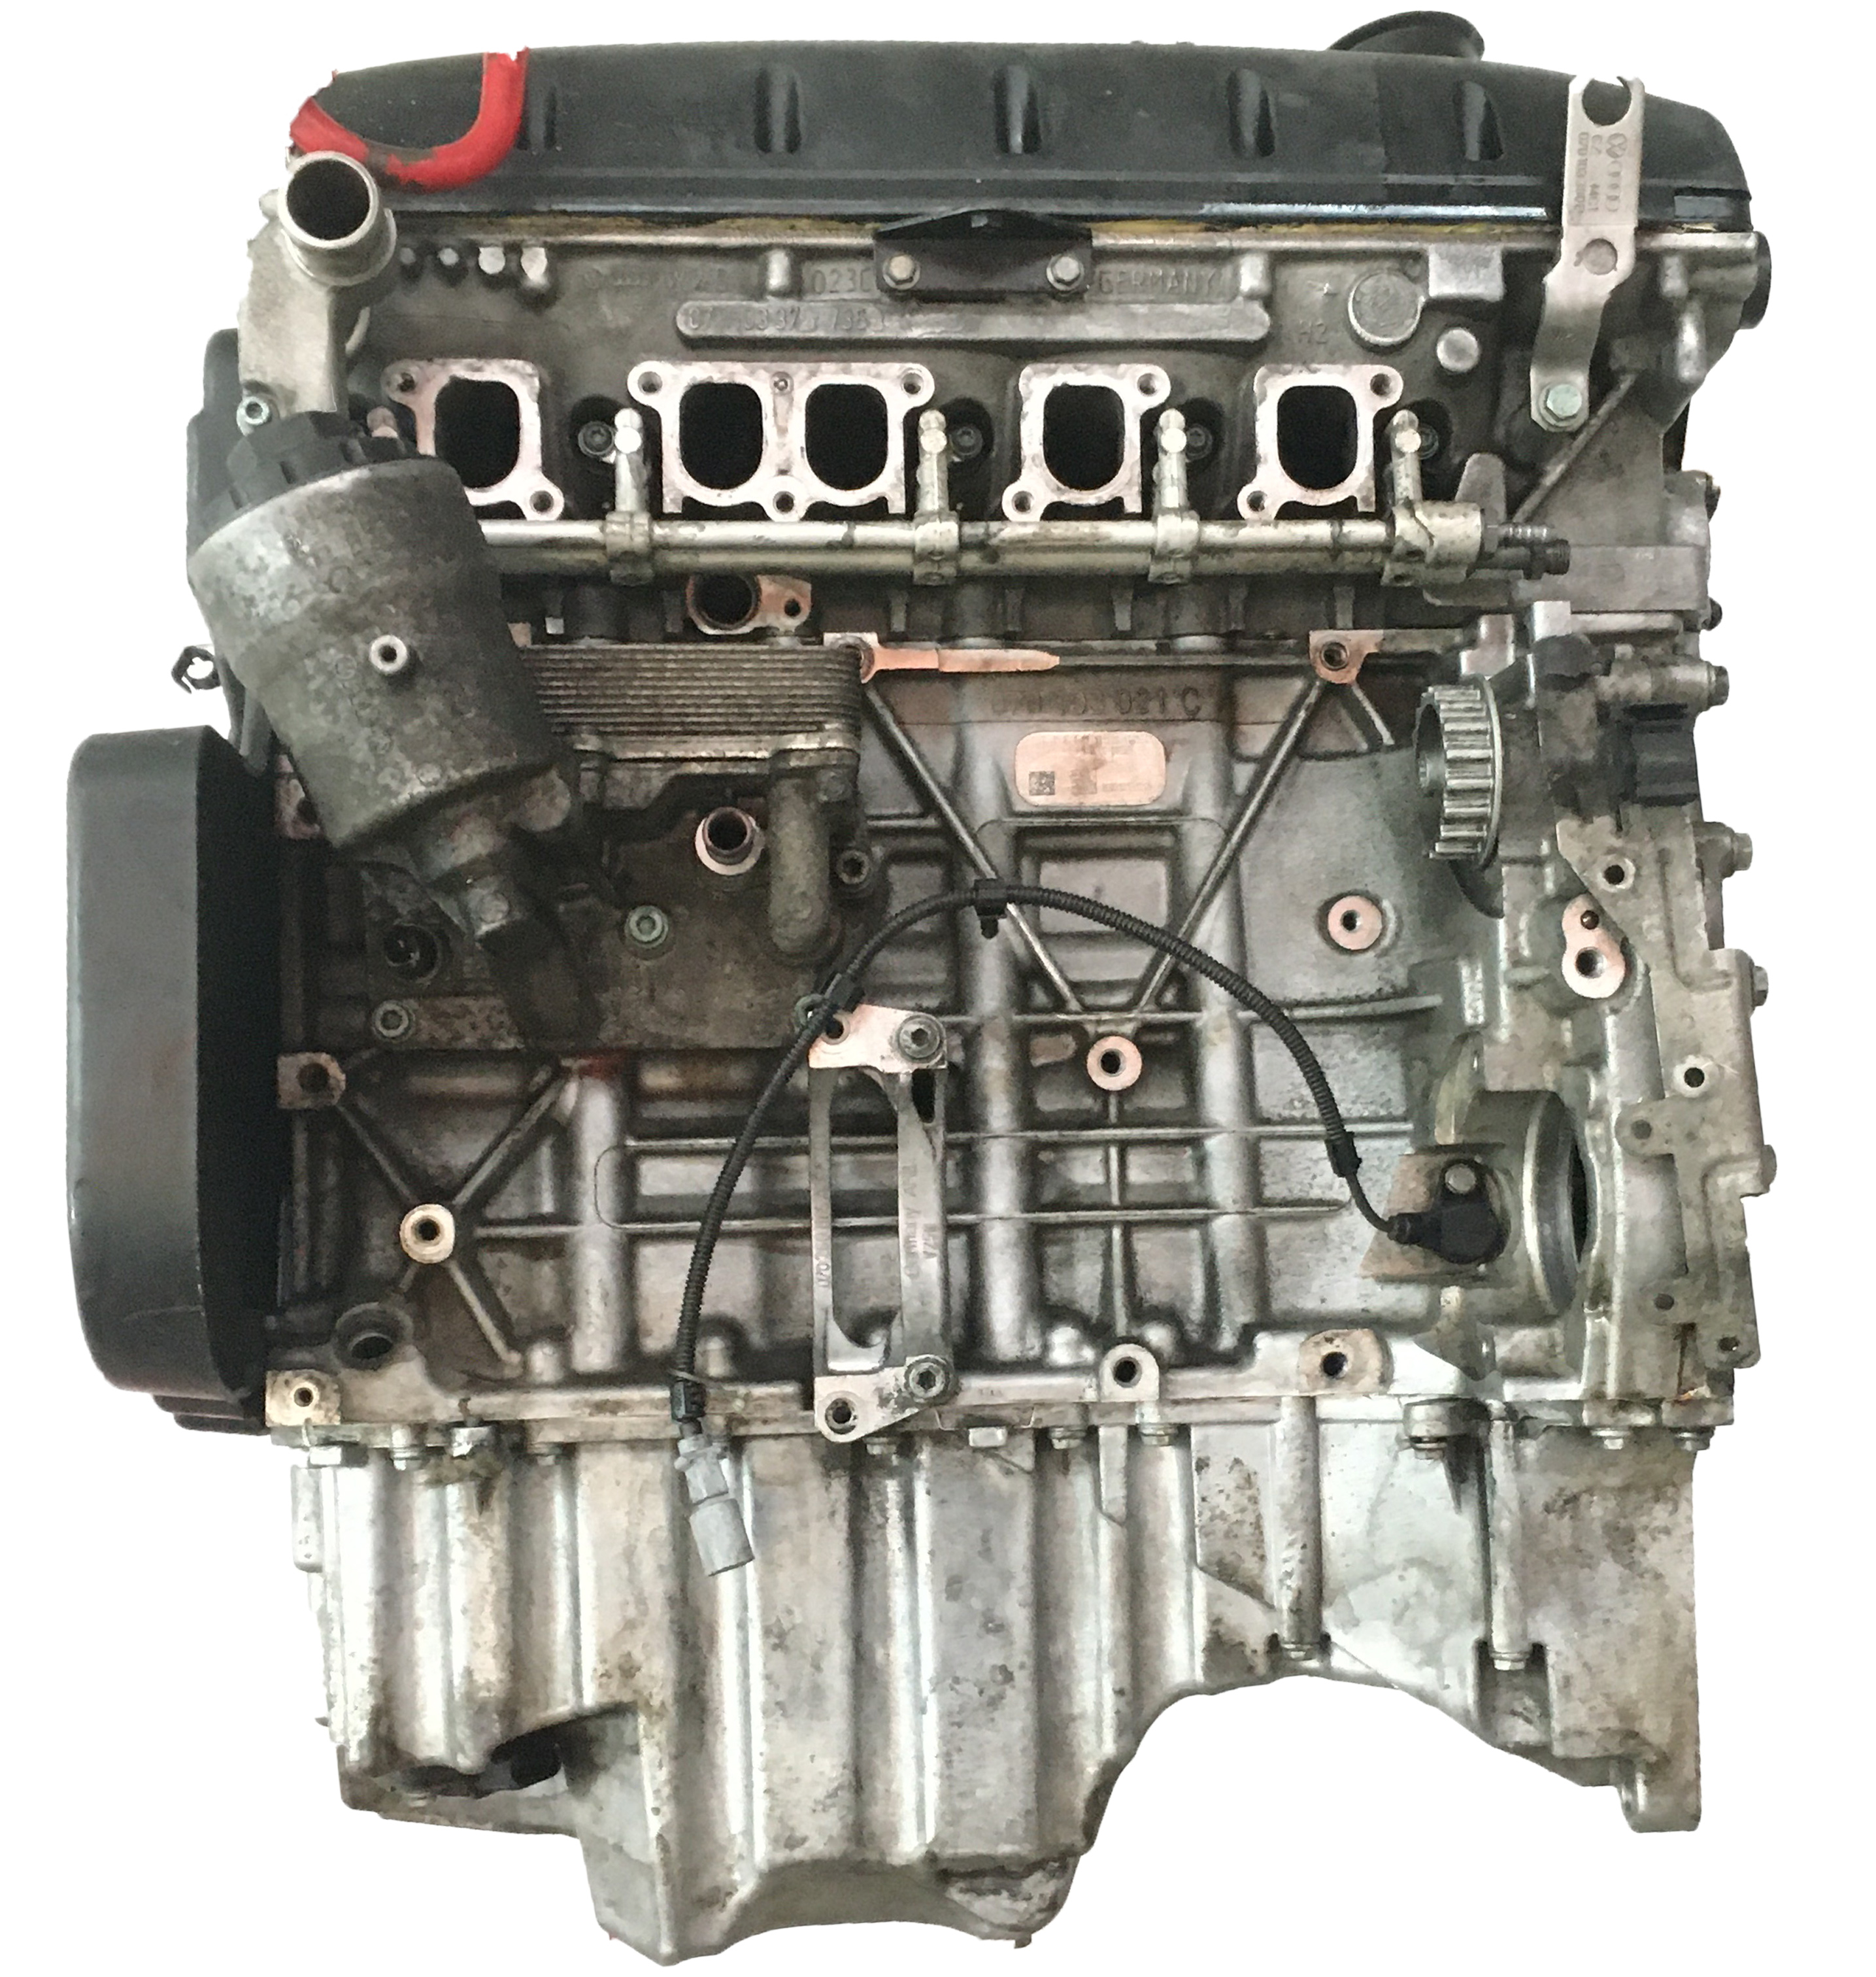 Motor 2007 VW Touareg 7L 2,5 R5 TDI Diesel BAC 174 PS